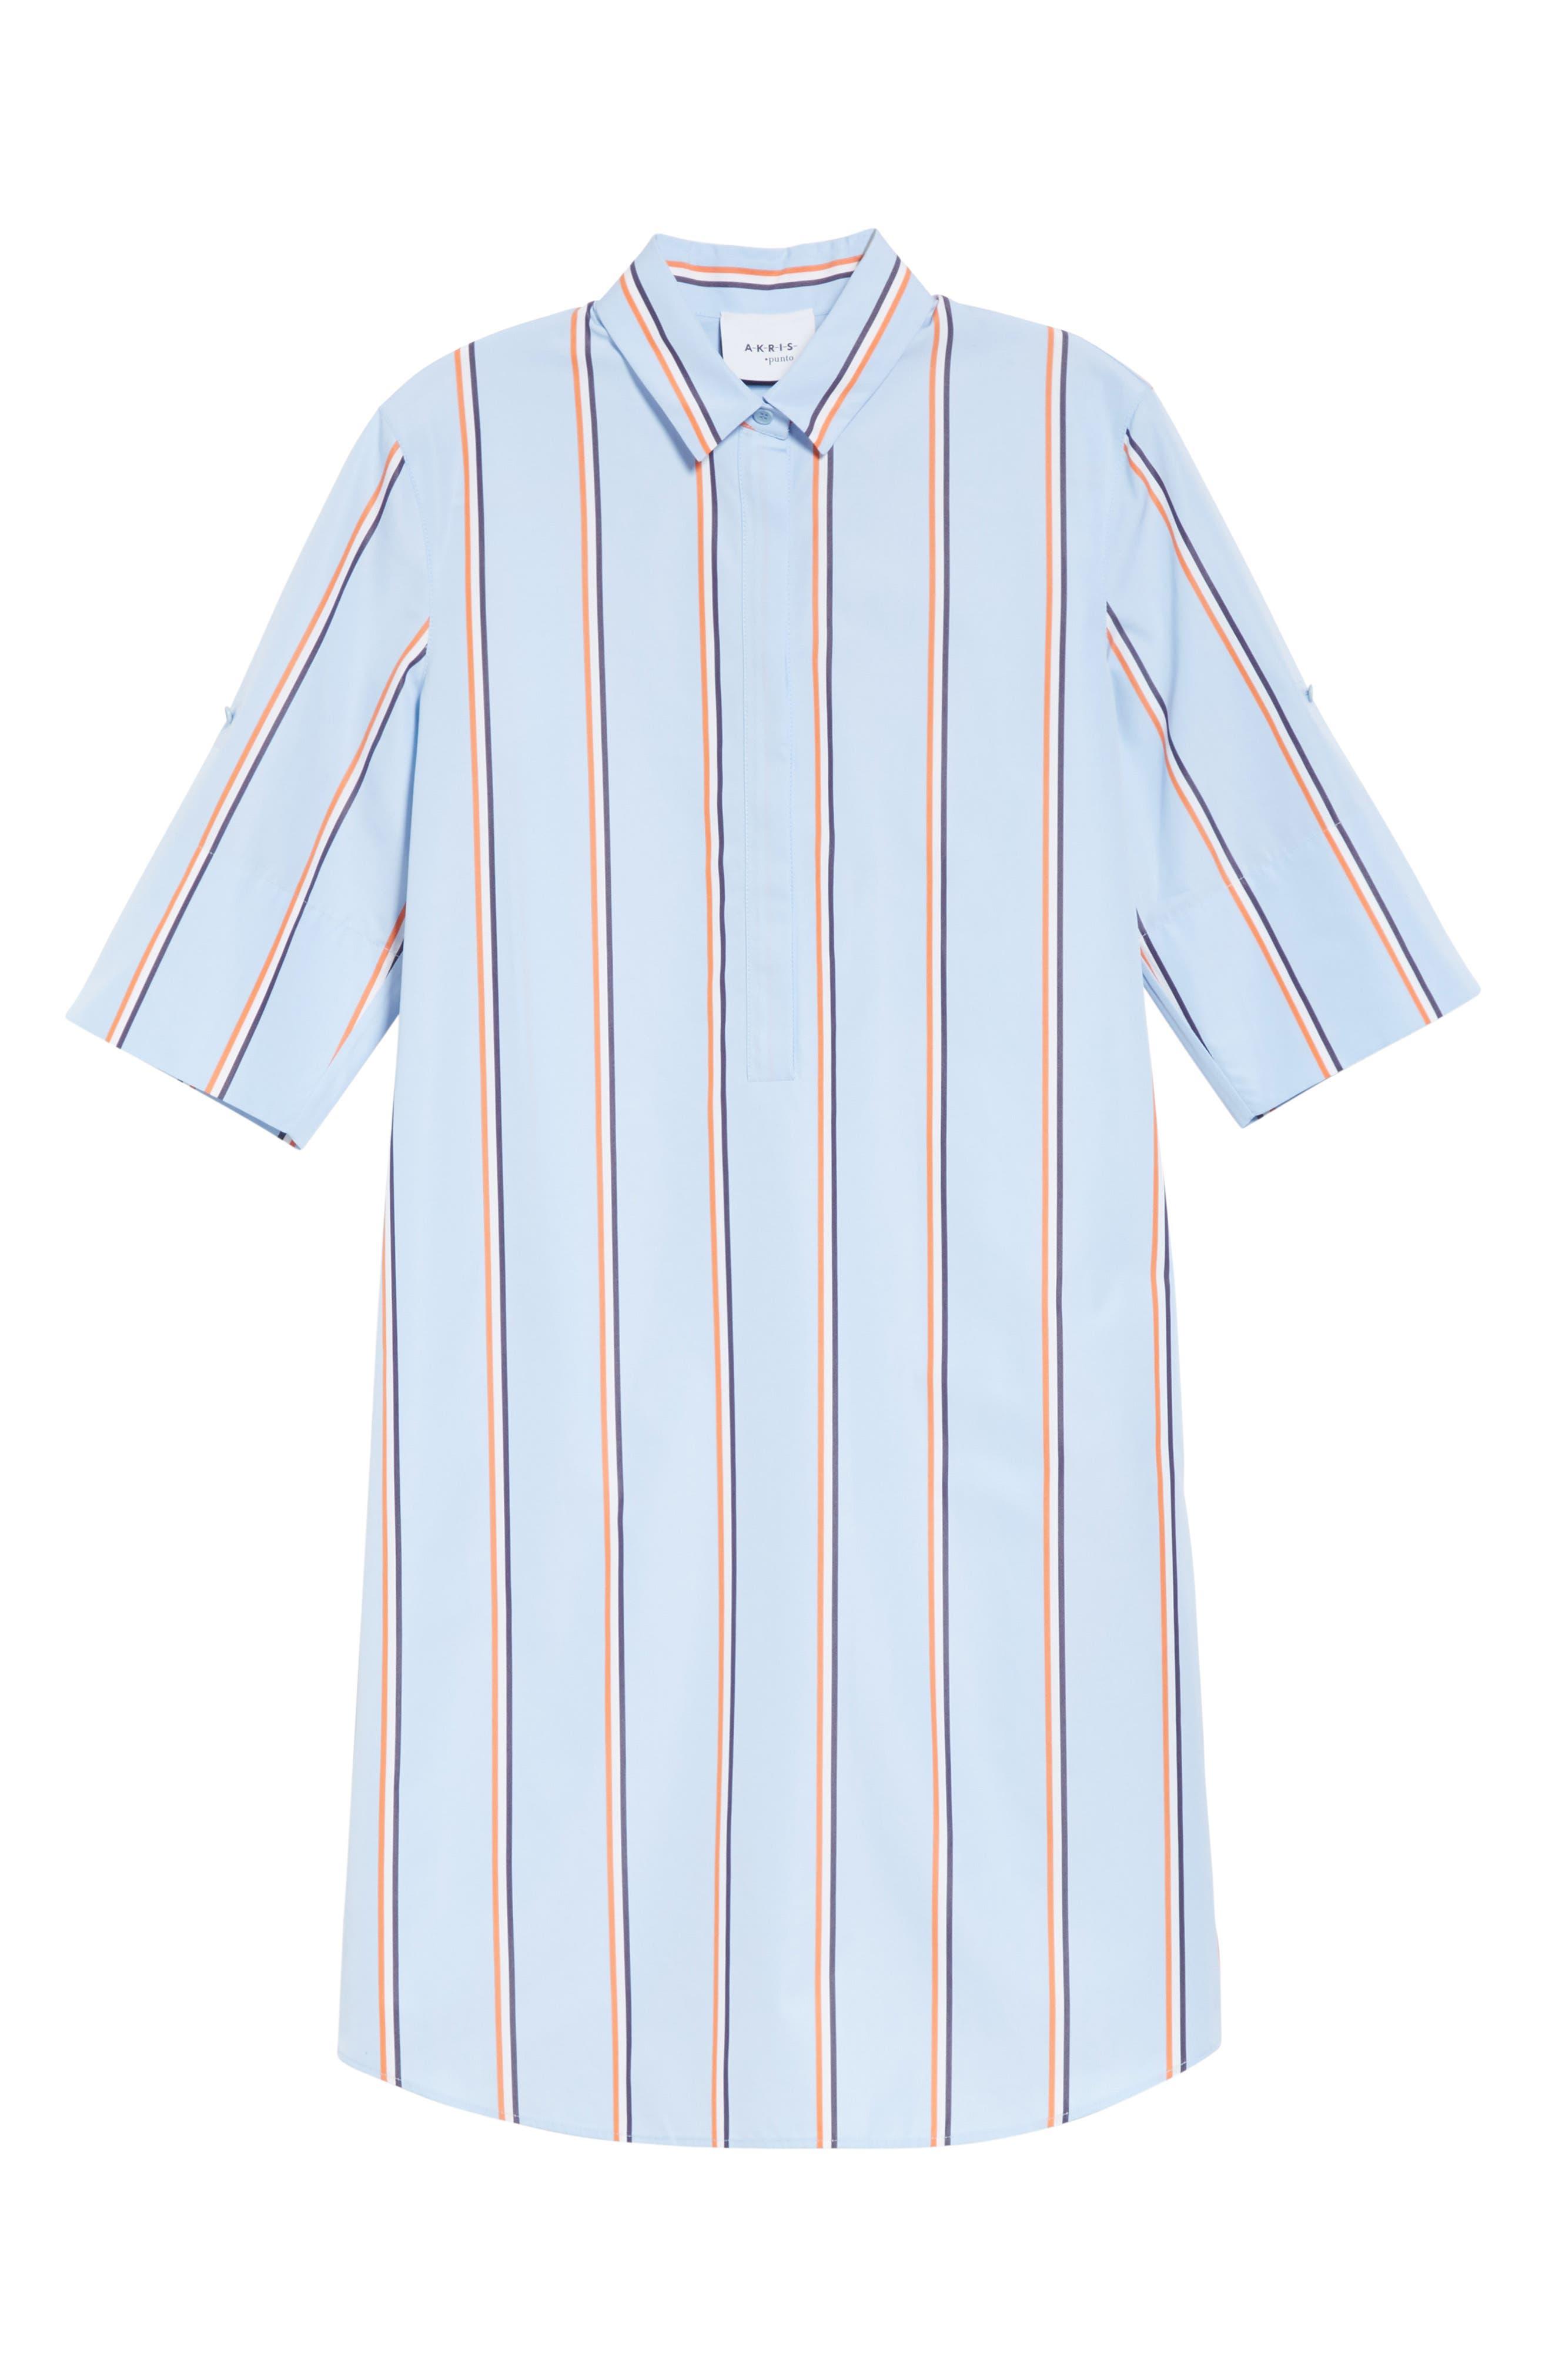 Stripe Cotton Shirtdress,                             Alternate thumbnail 3, color,                             CIELO-MULTICOLOR